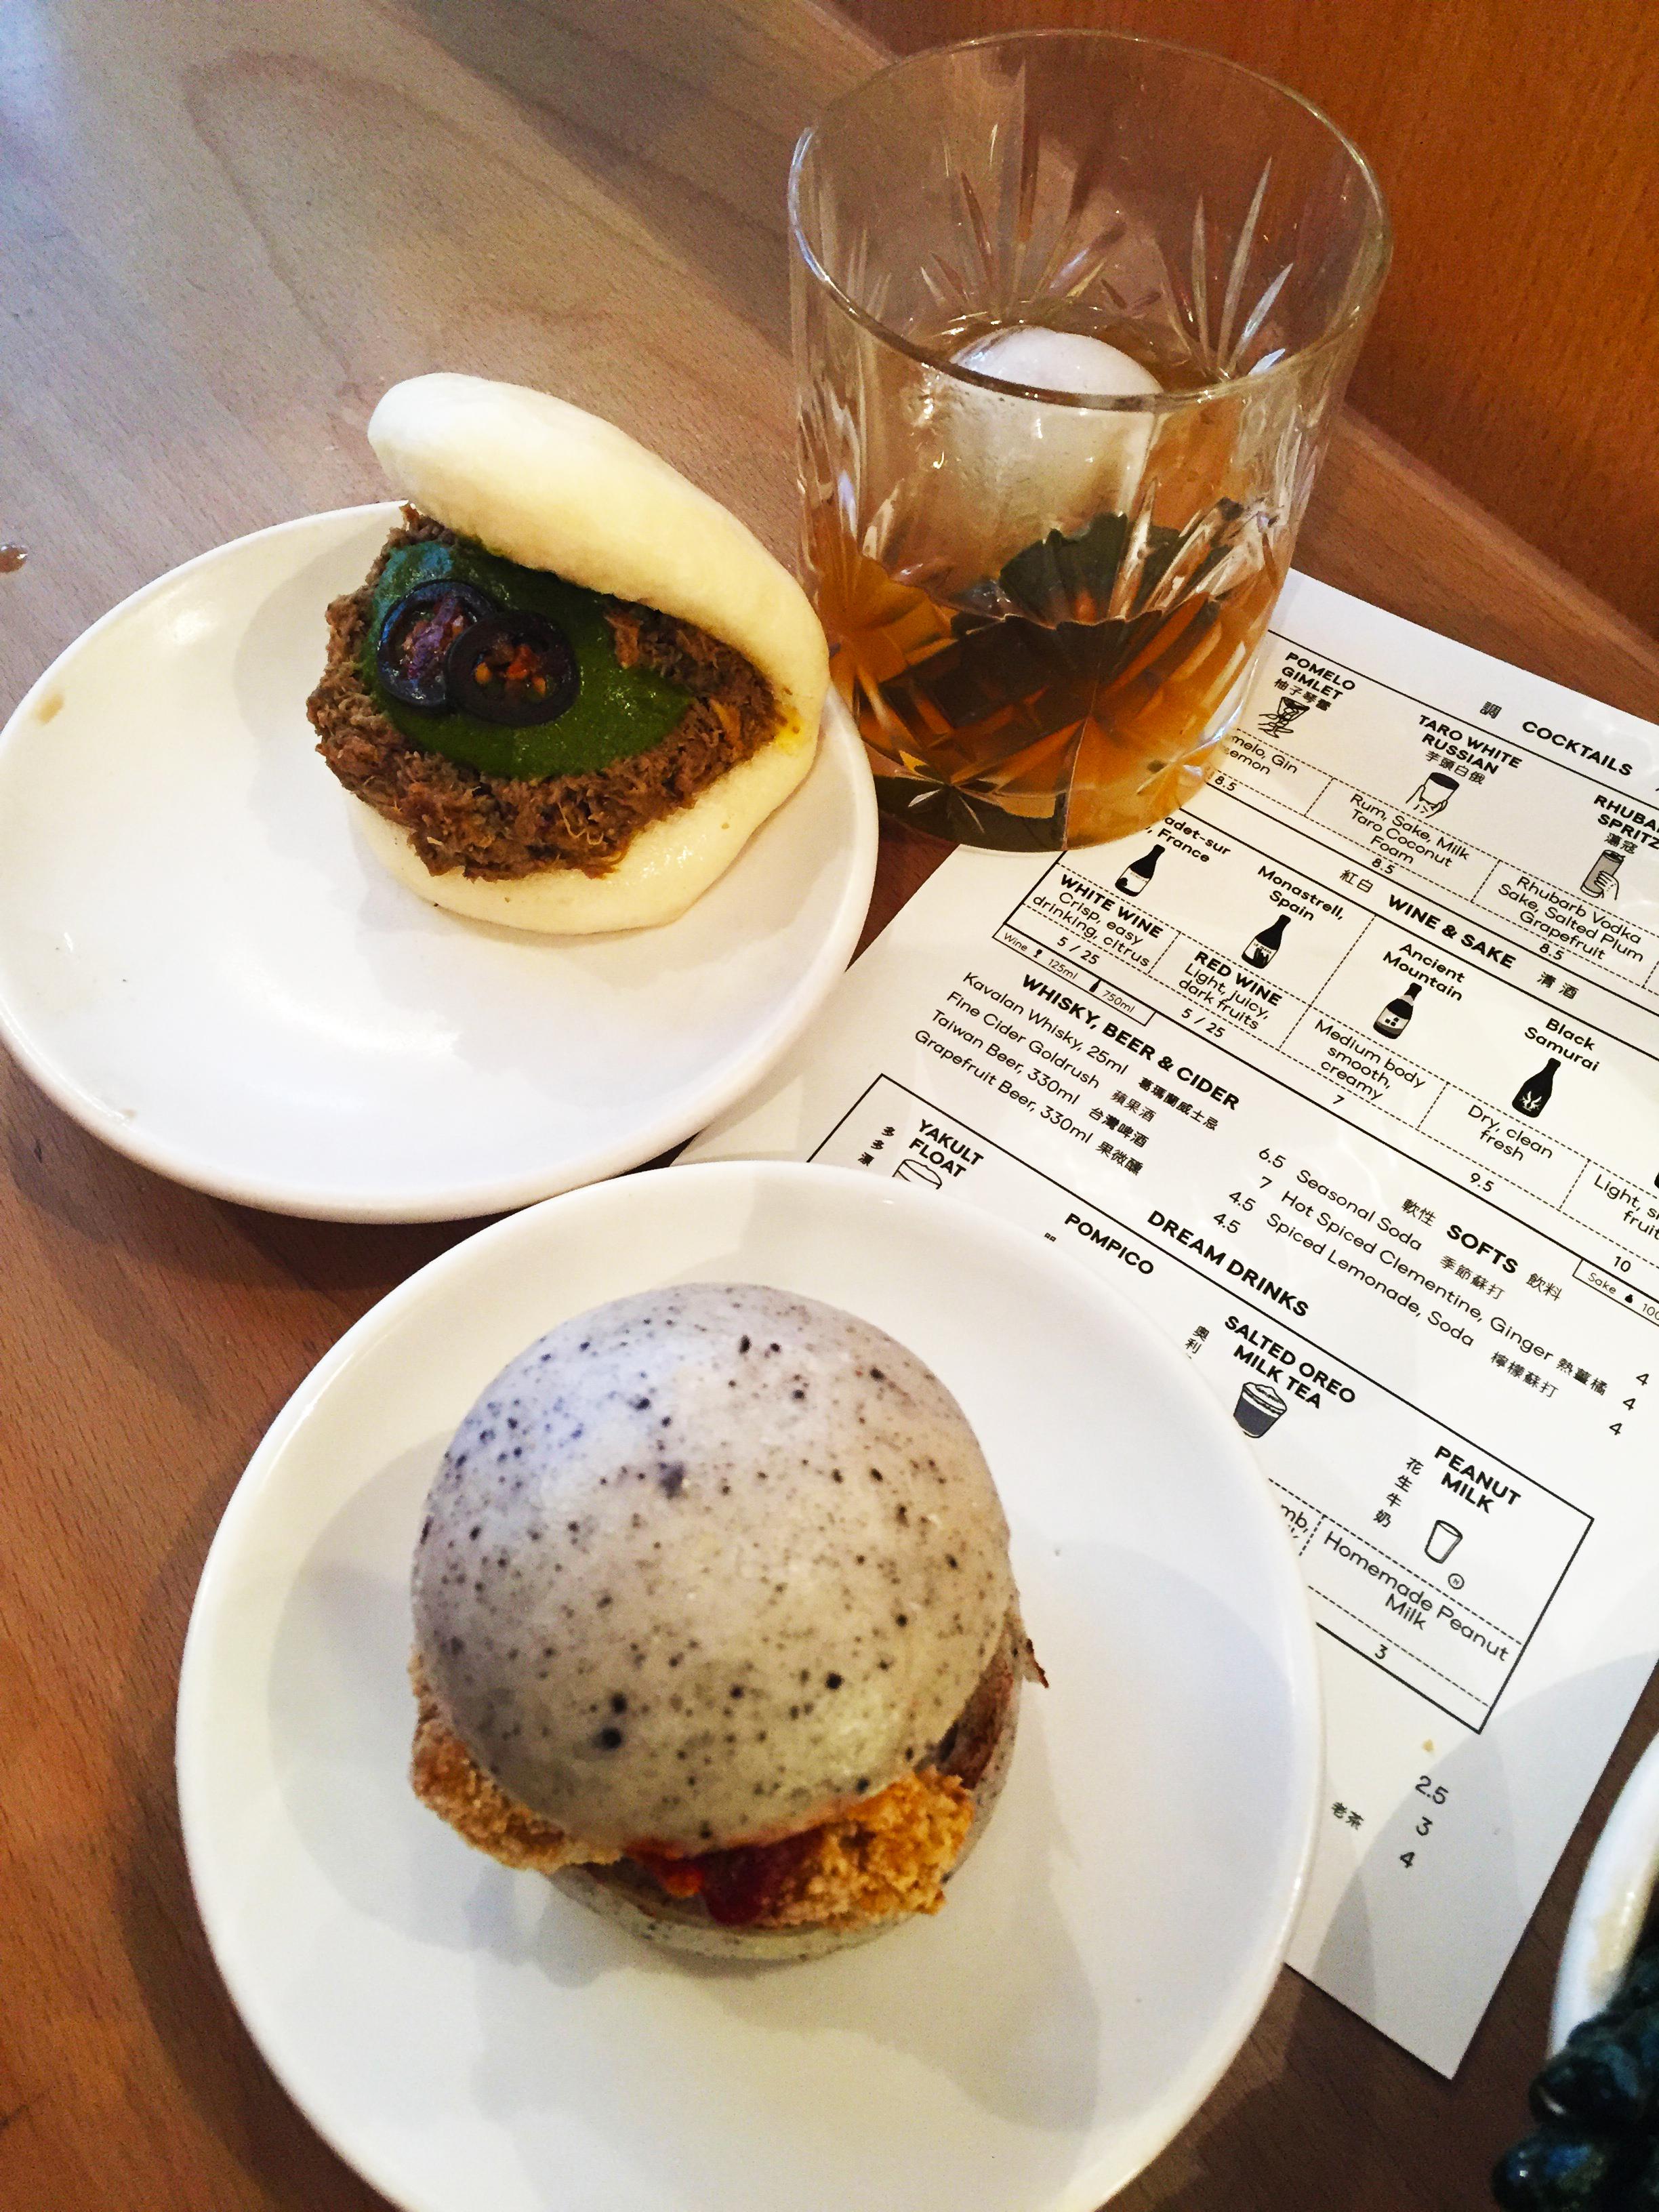 Delicious bao buns and a tasty cocktail at Bao Soho